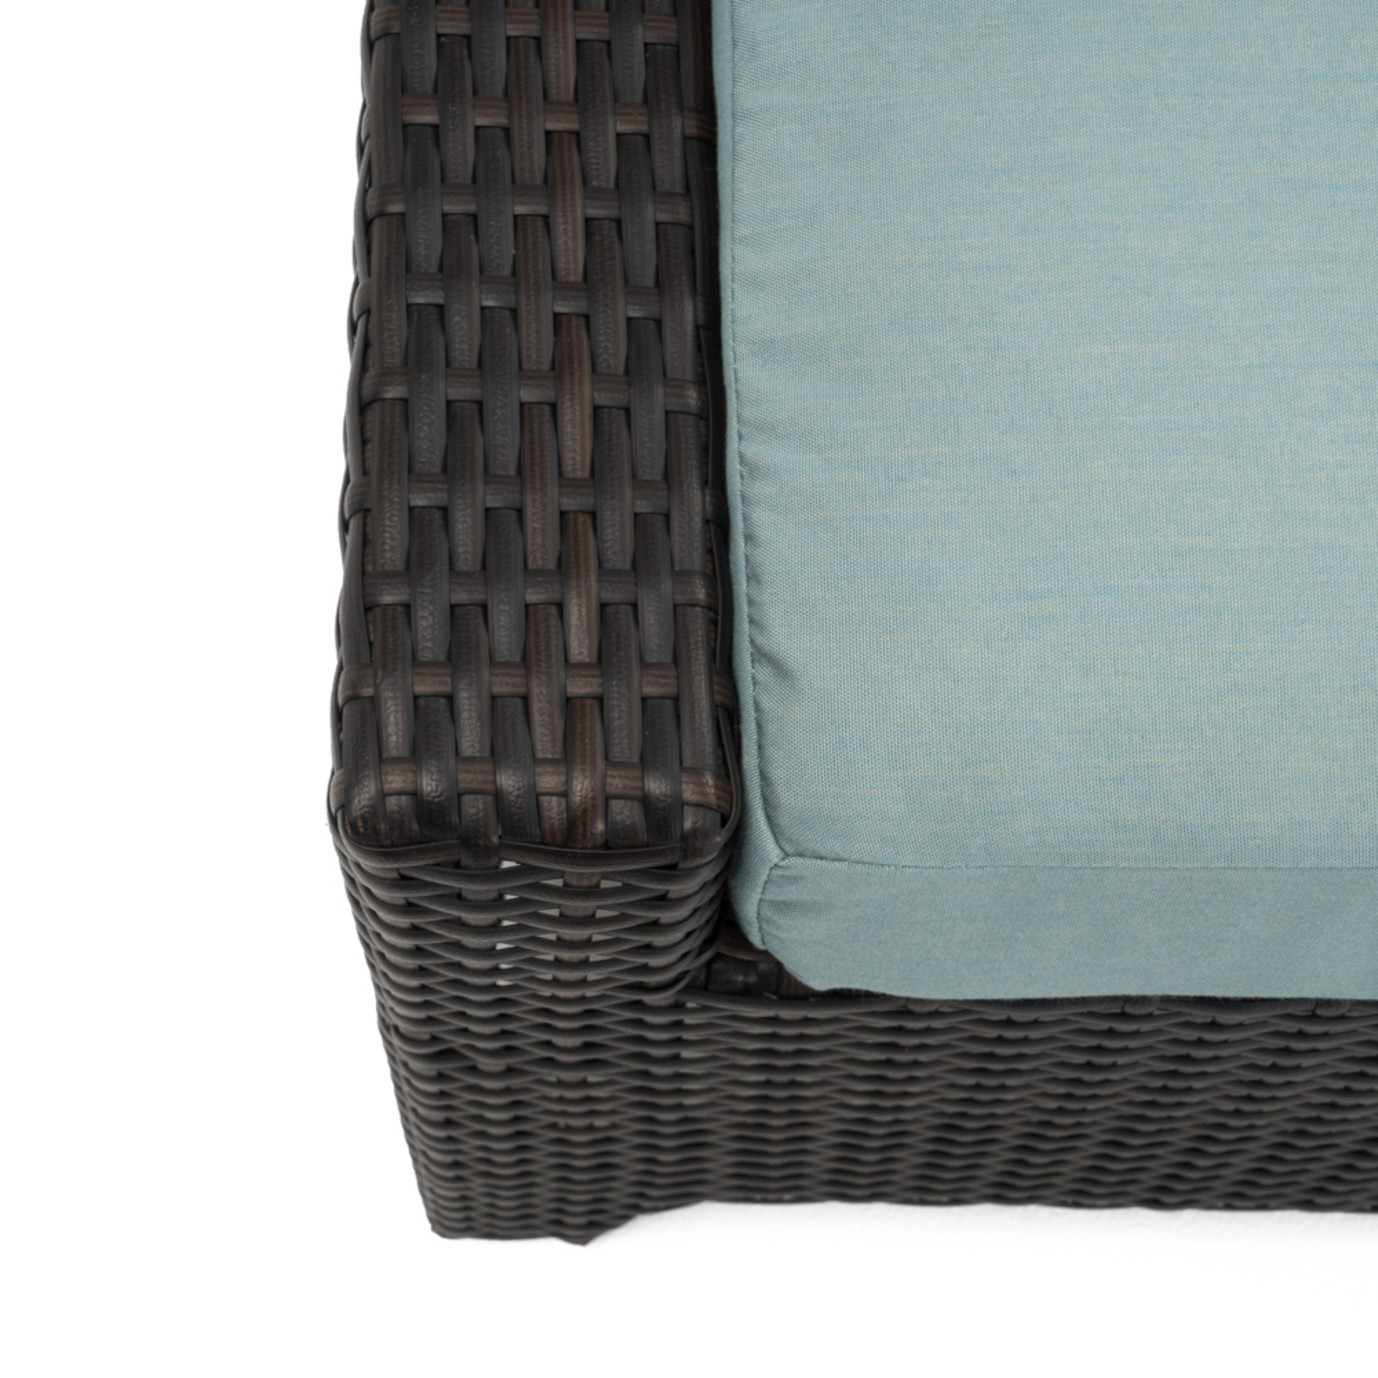 Deco™ 8pc Sofa and Club Chair Set - Bliss Blue